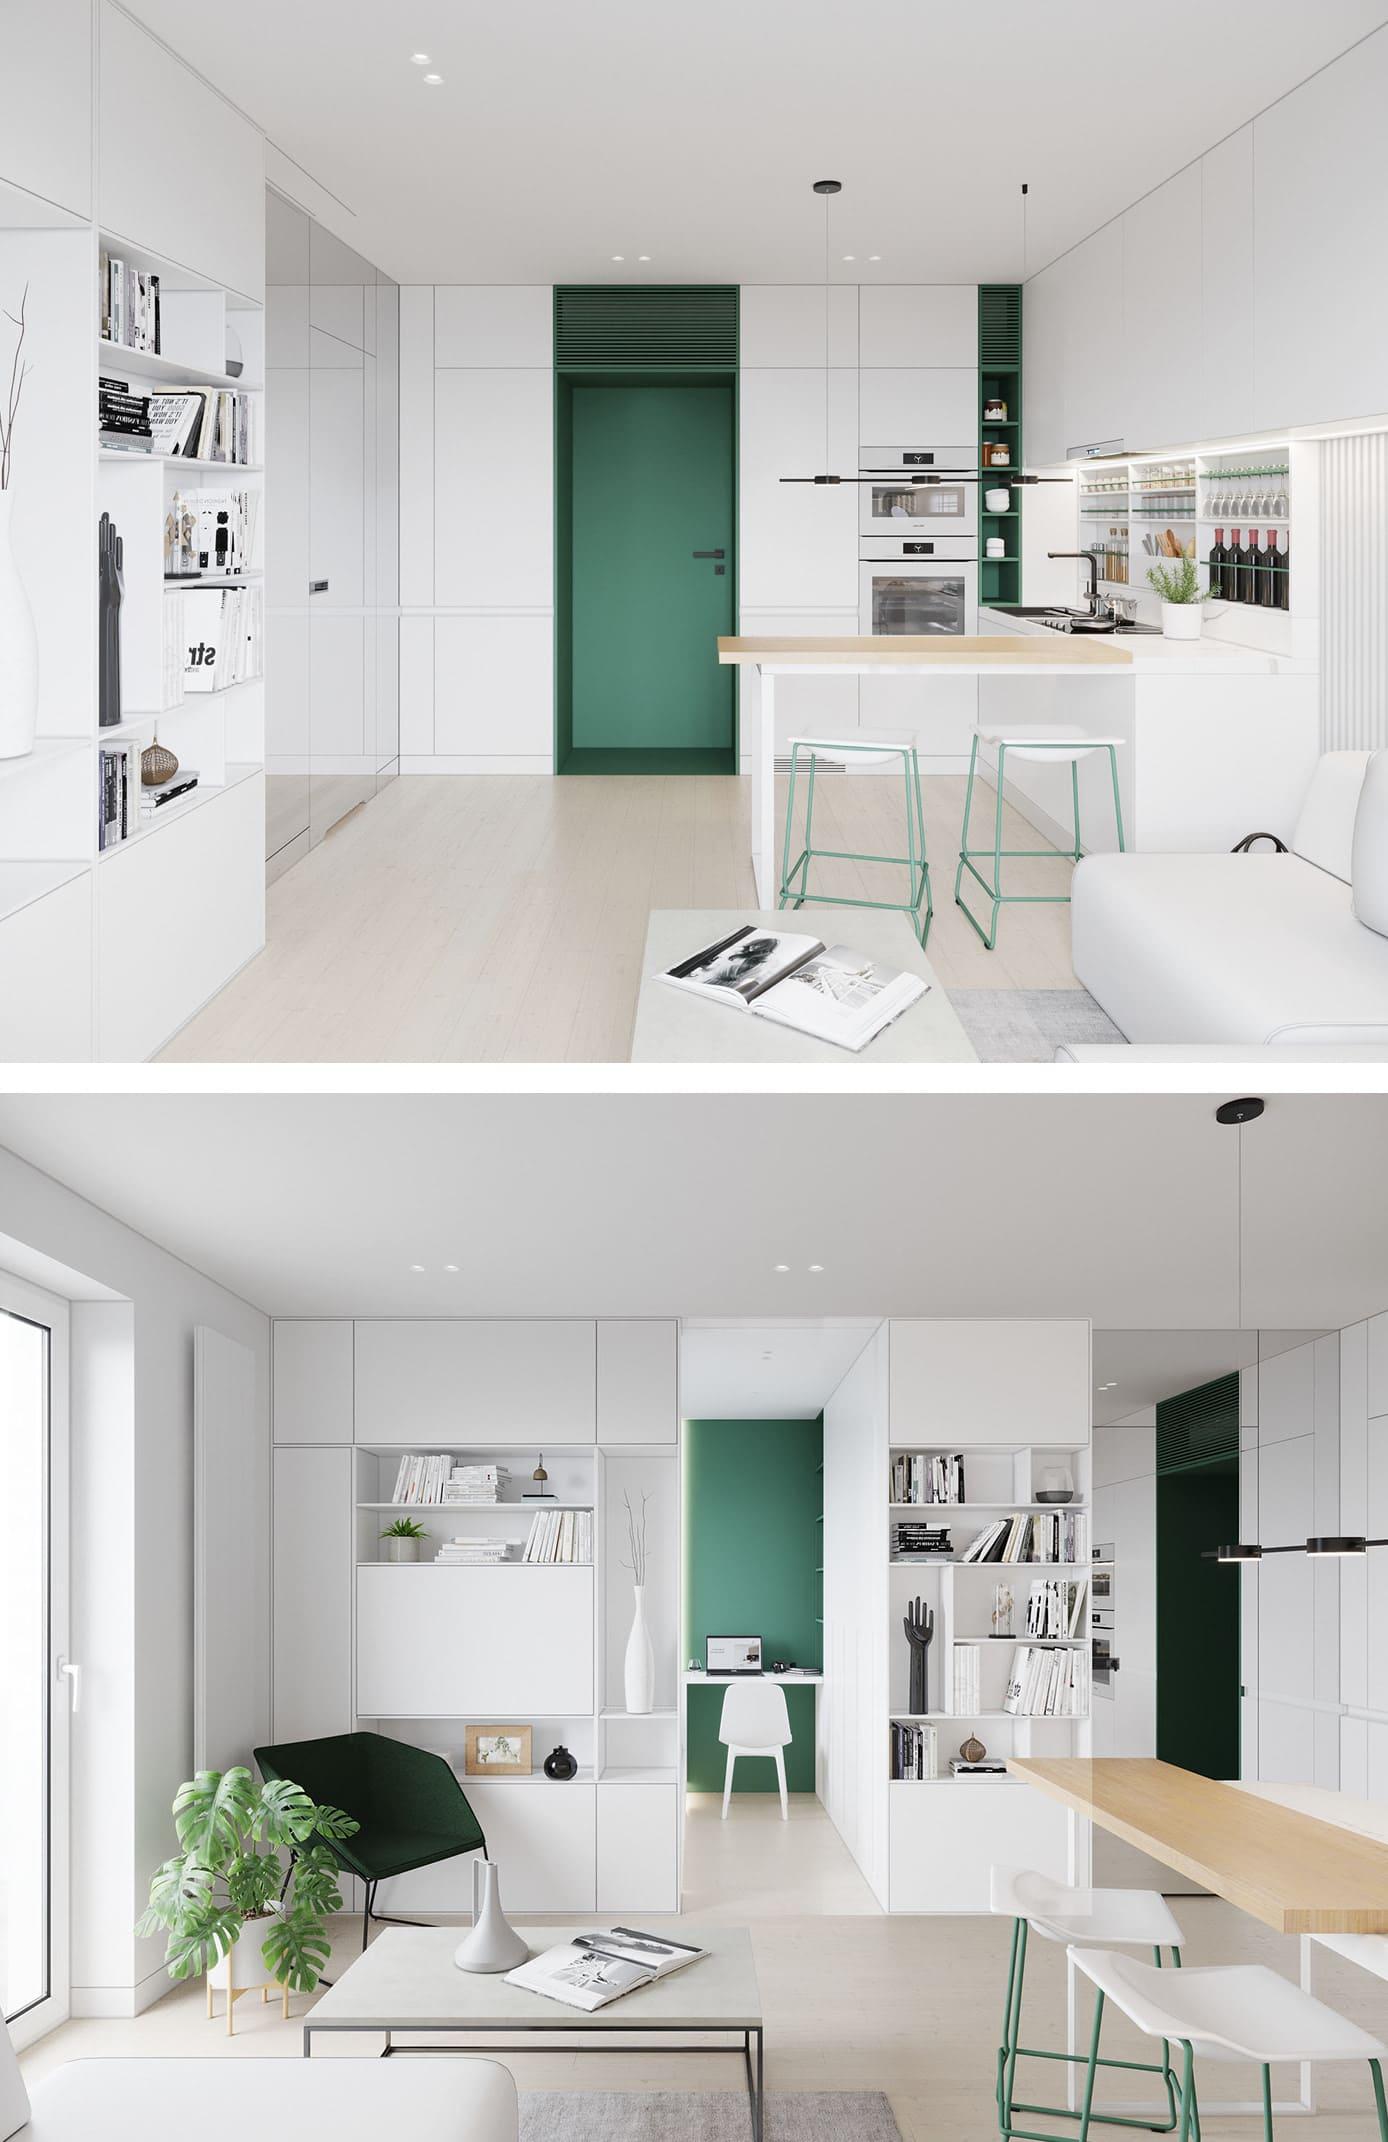 дизайн однокомнатной квартиры фото 74